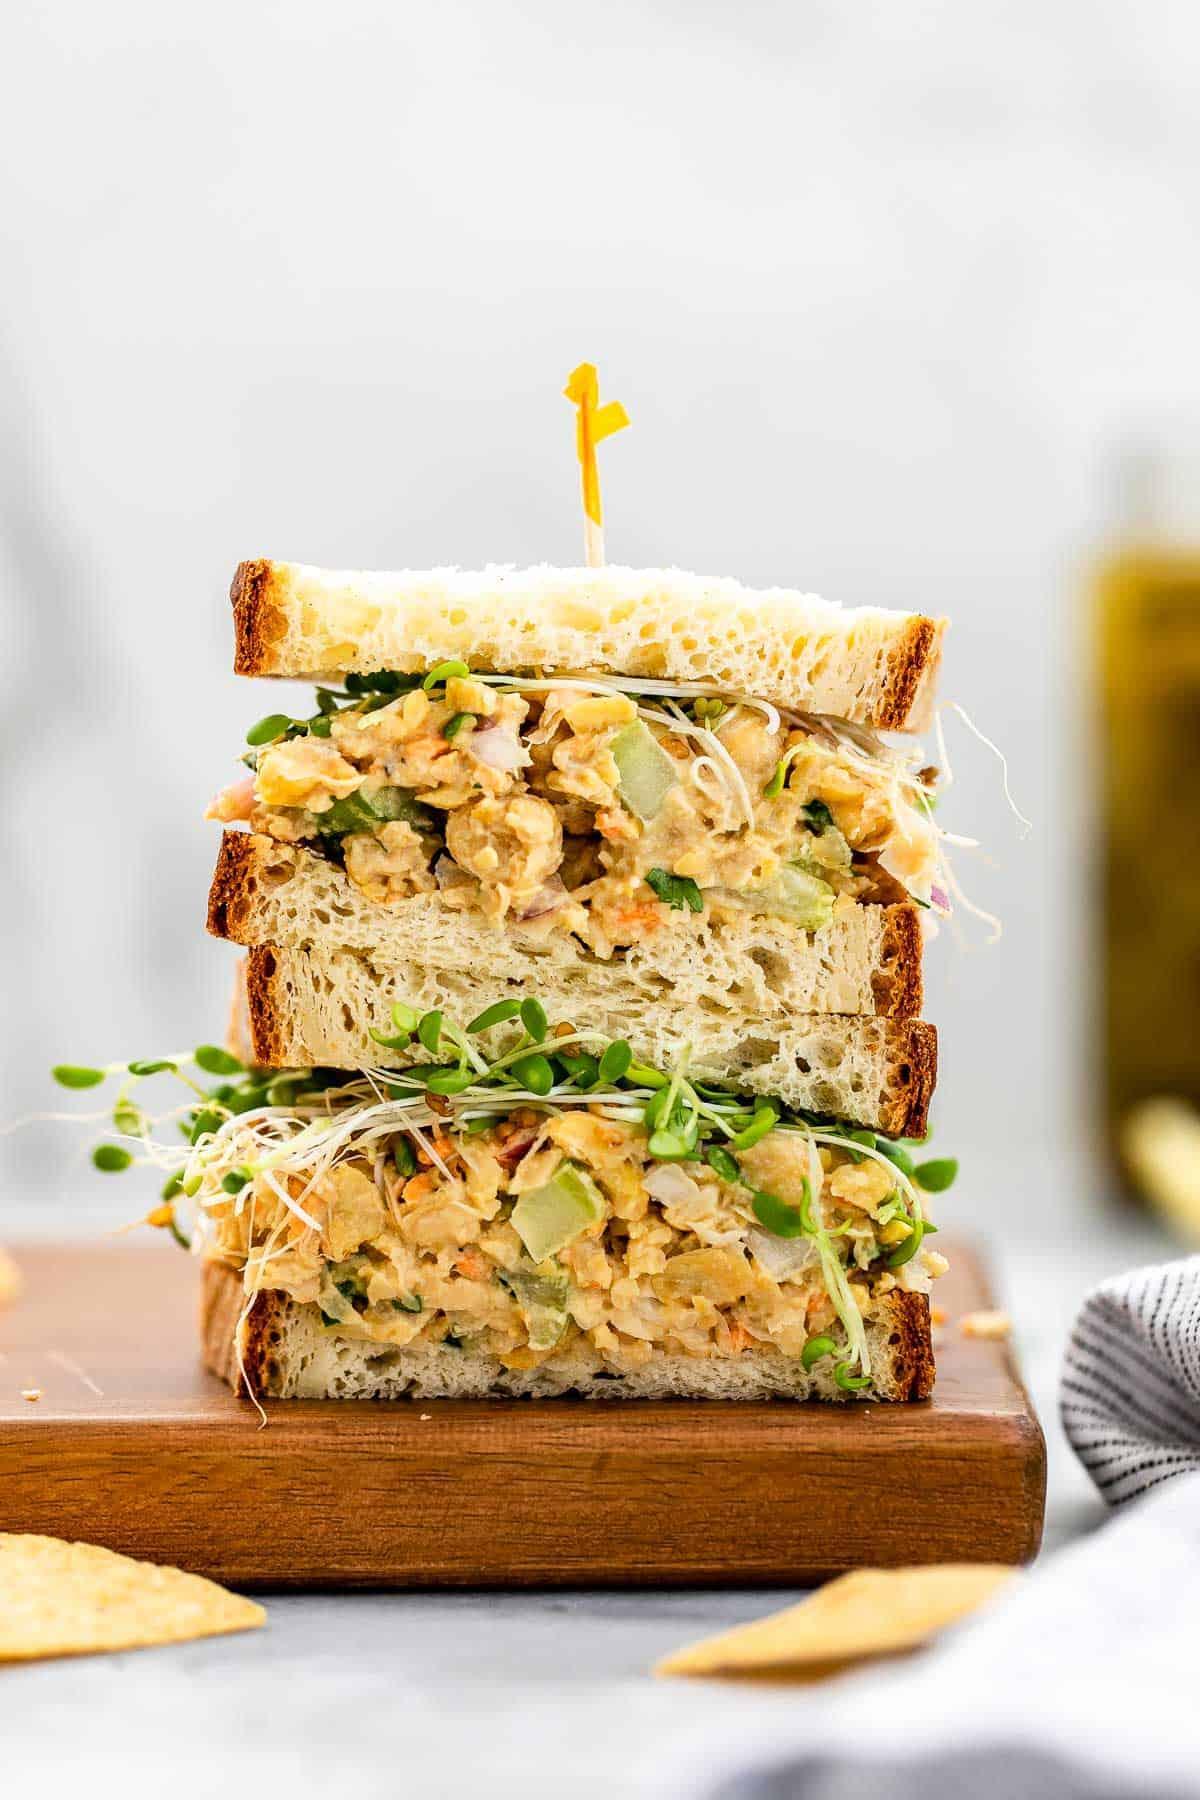 Vegan tuna salad sandwich on a wood board.